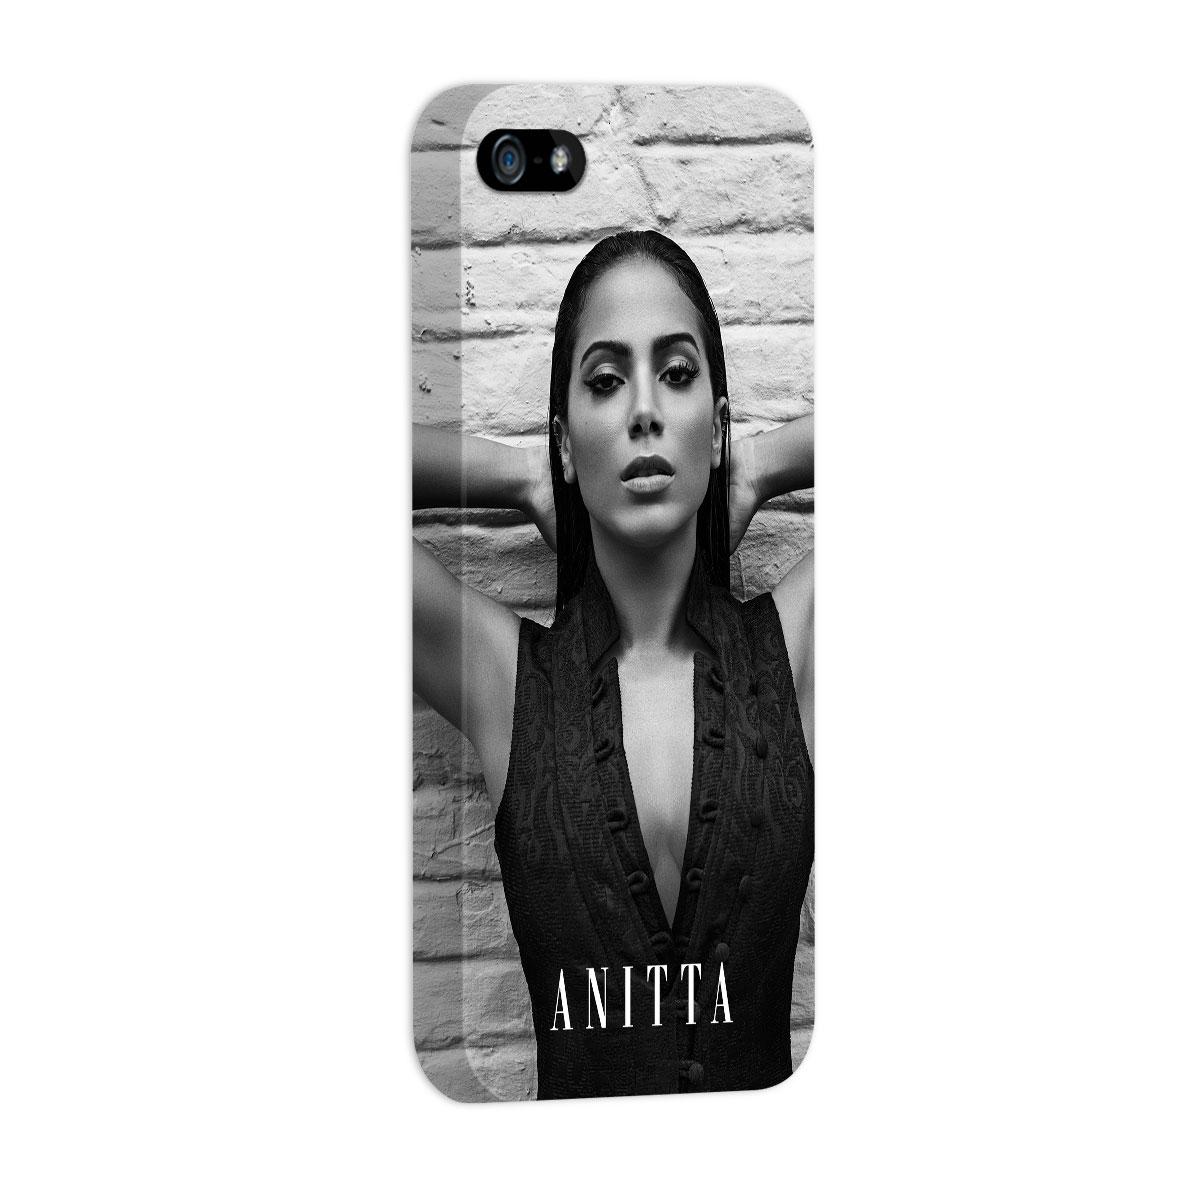 Capa para iPhone 5/5S Anitta P&B